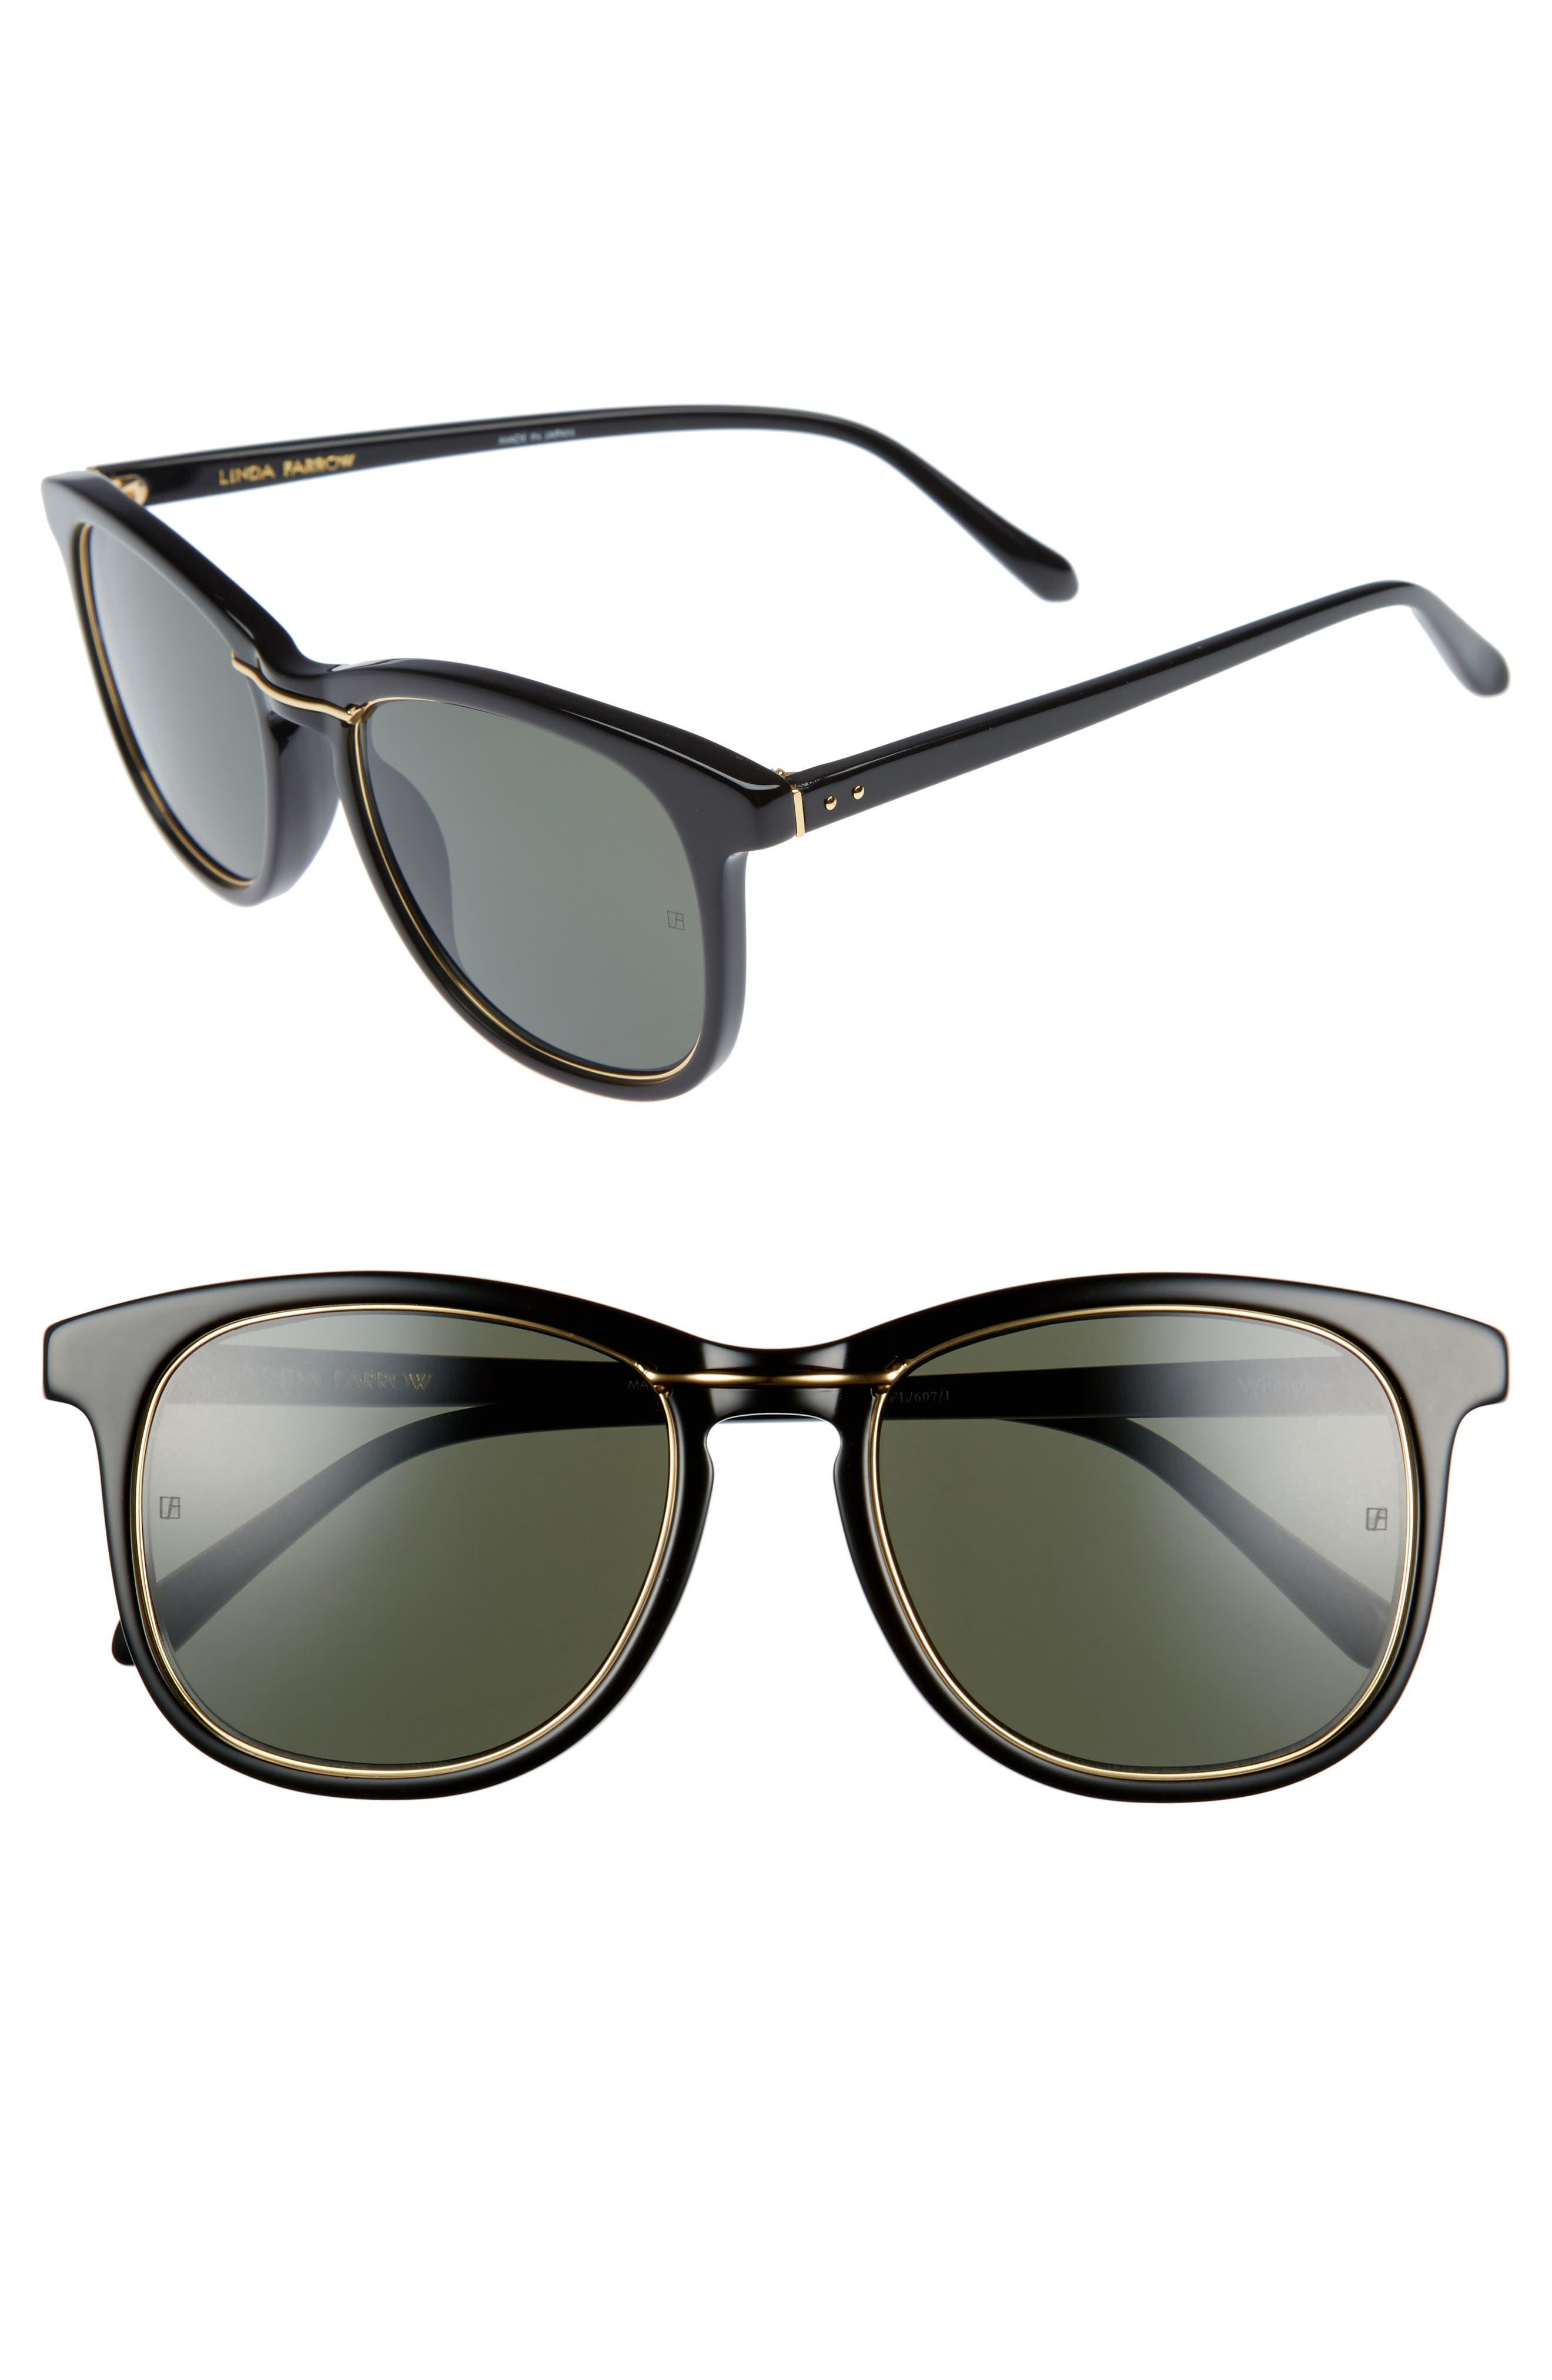 53mm Sunglasses,                         Main,                         color, Wilmott Black/ Yellow Gold